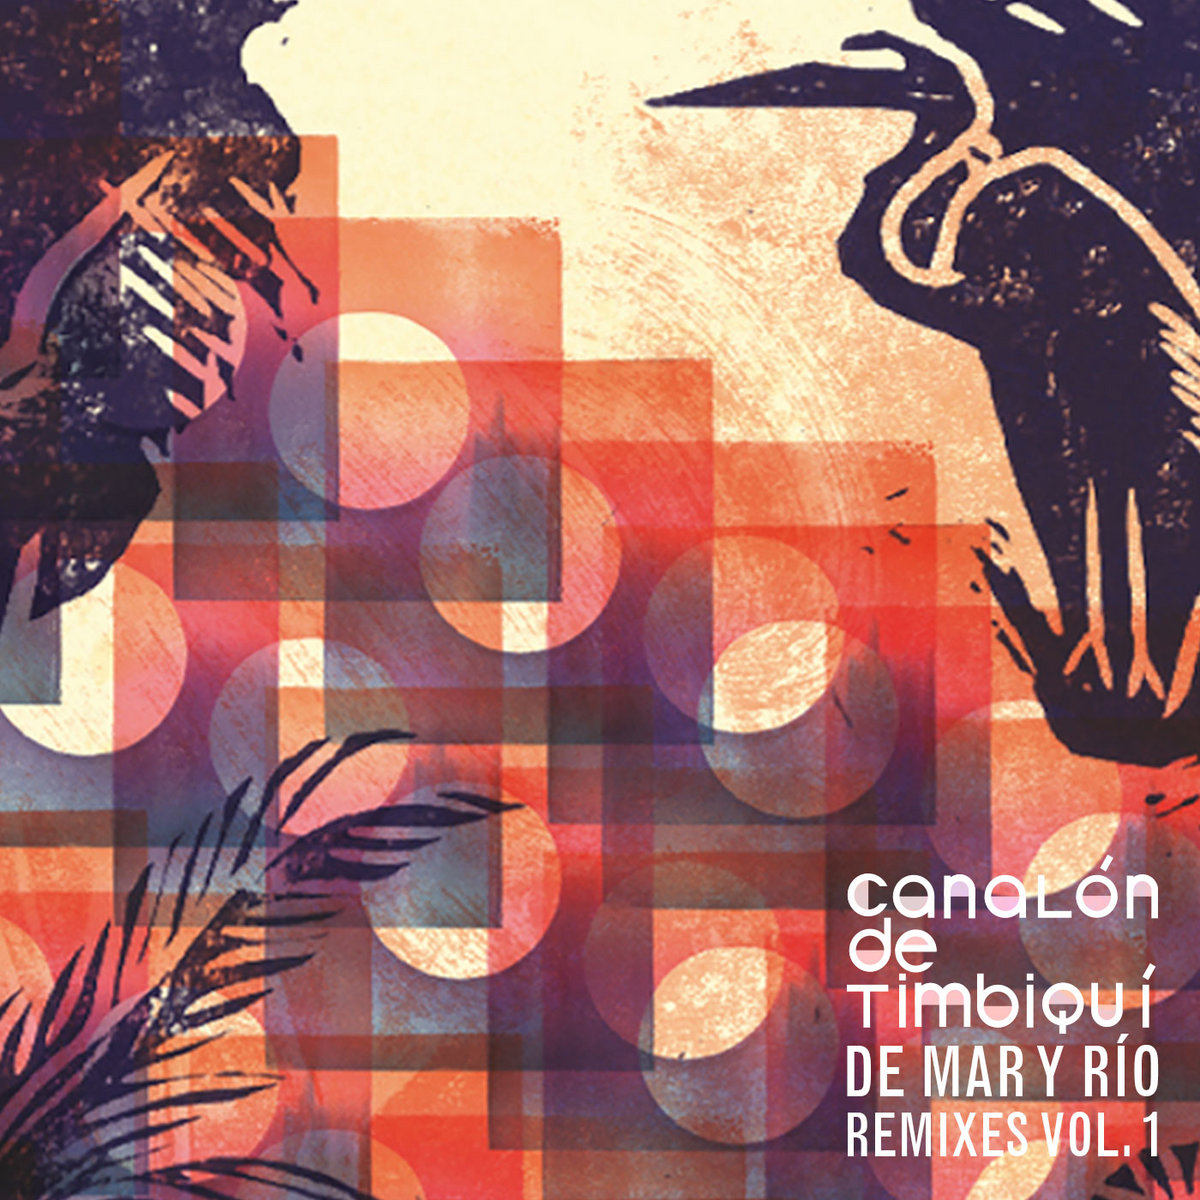 Canalón de Timbiquí - De mar y río remixes vol  1 | Llorona